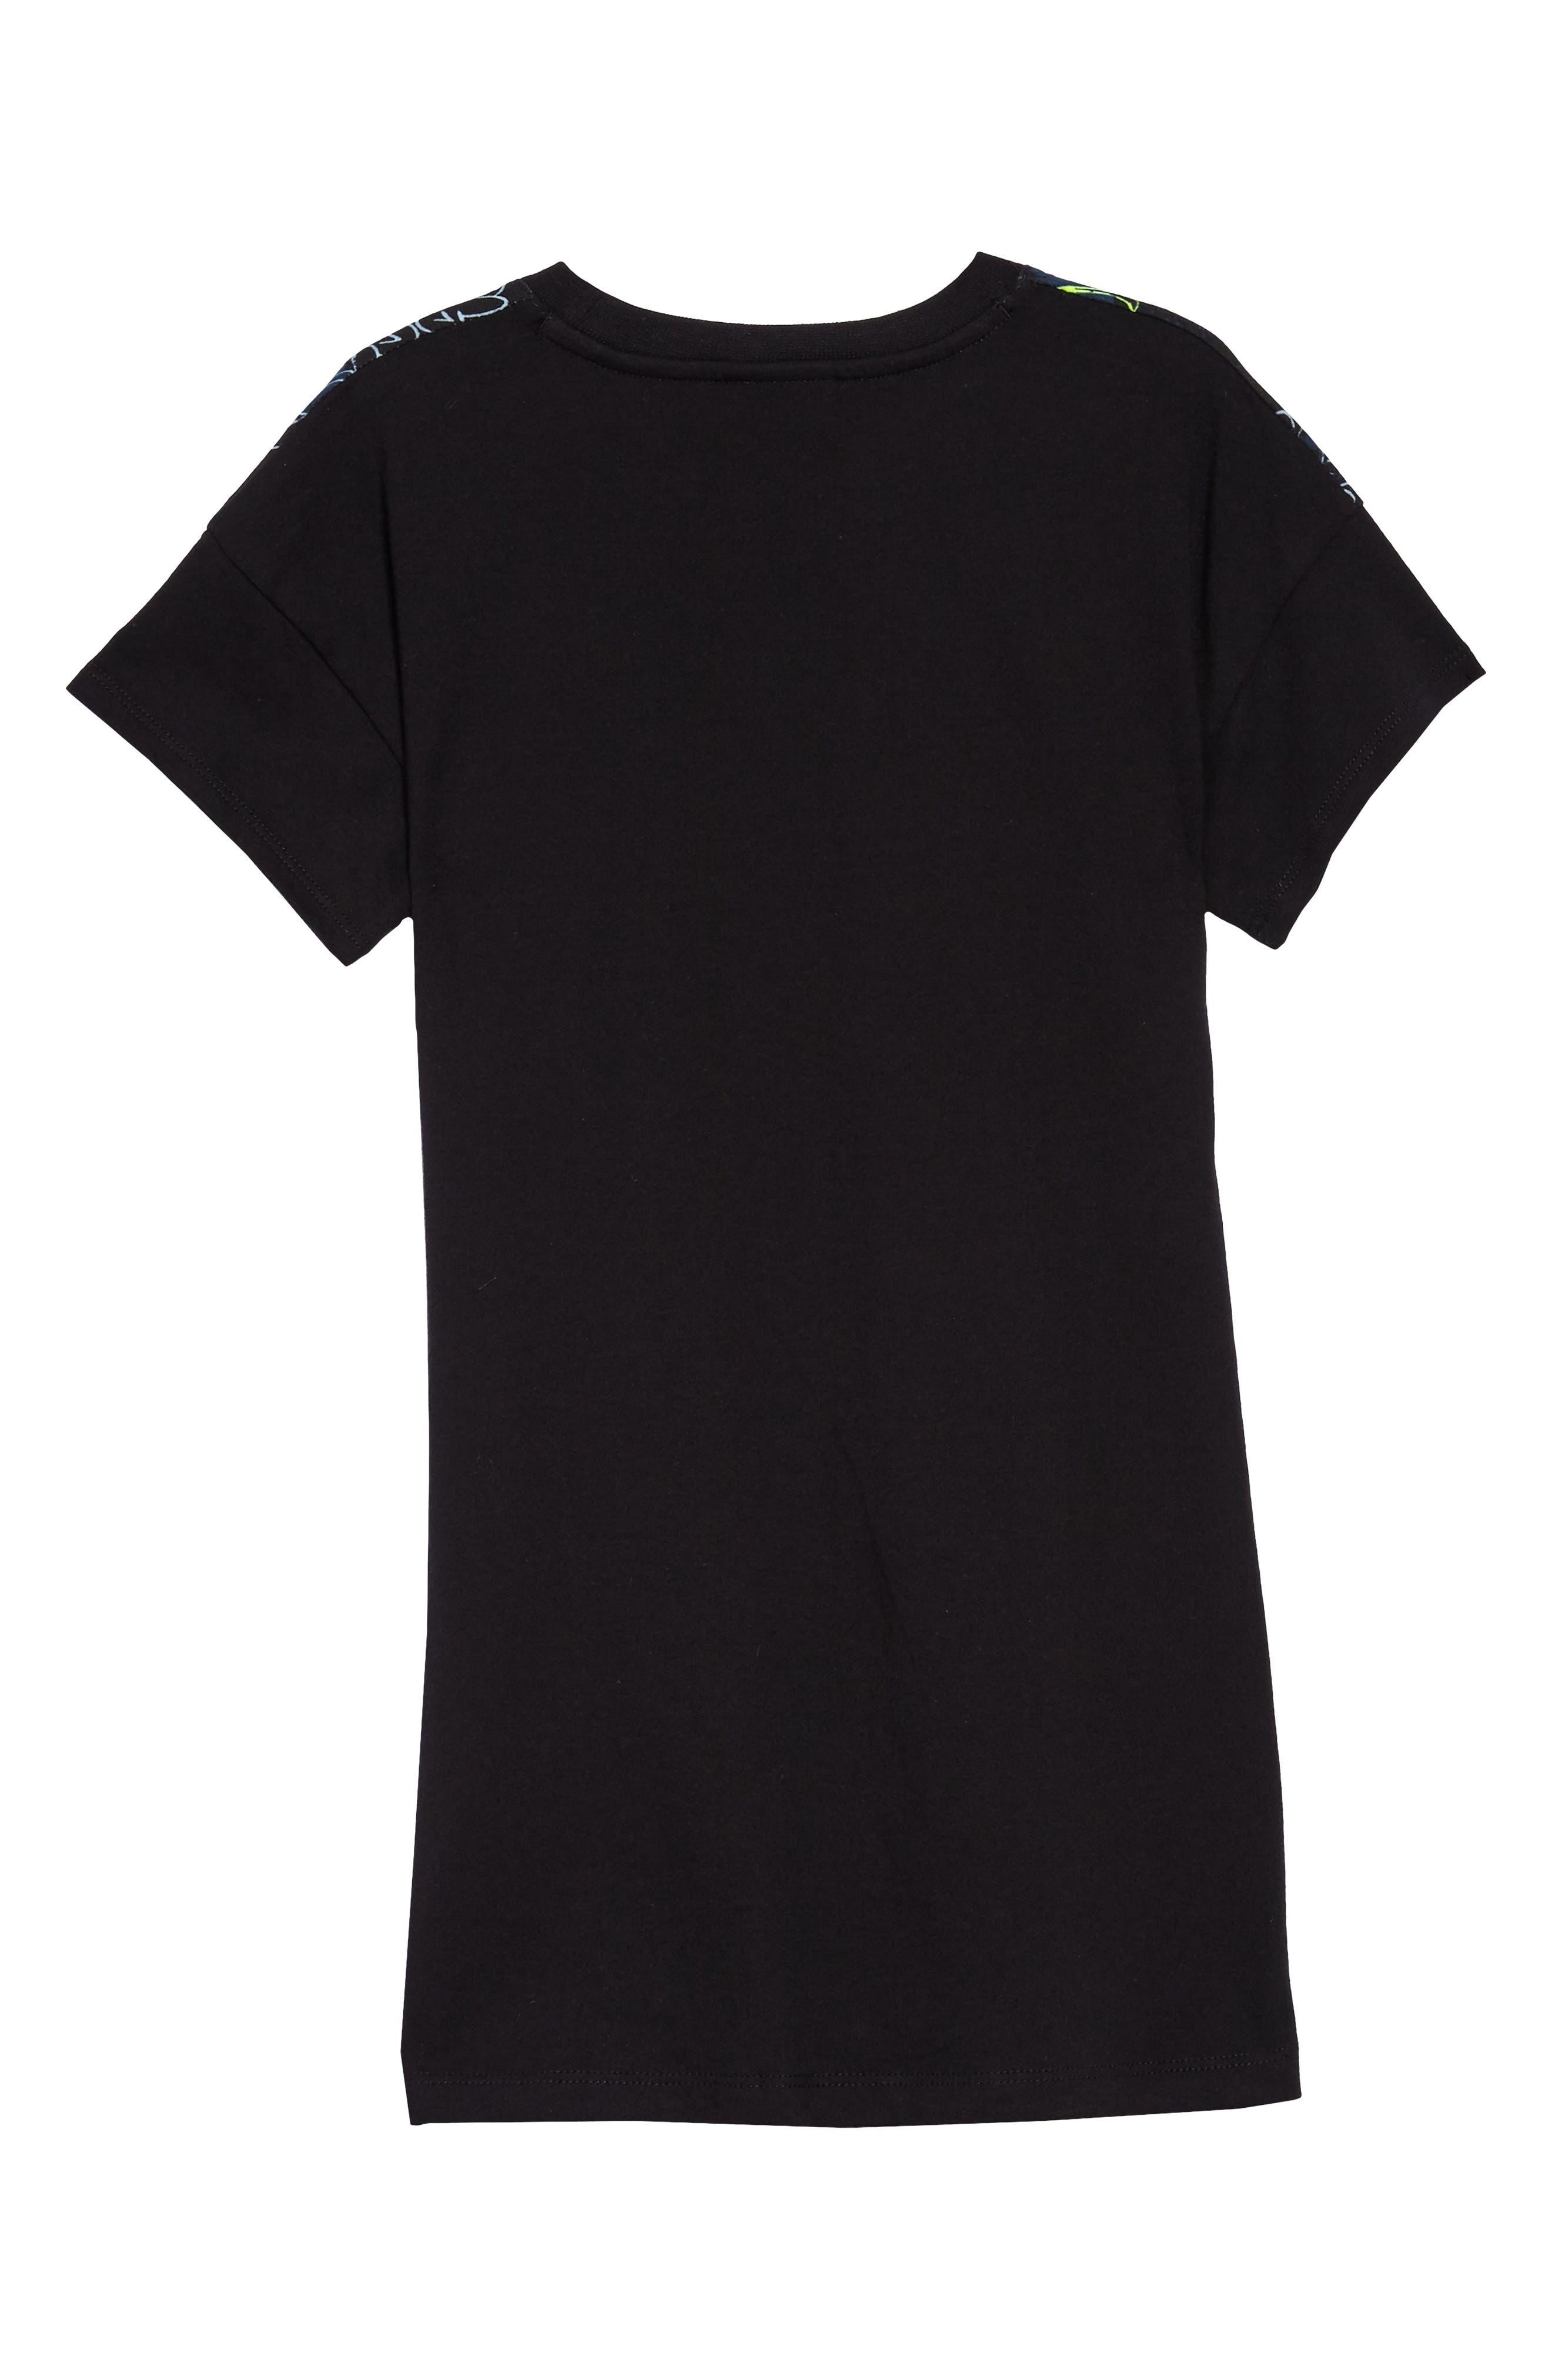 Sportswear Graphic T-Shirt Dress,                             Alternate thumbnail 2, color,                             Black